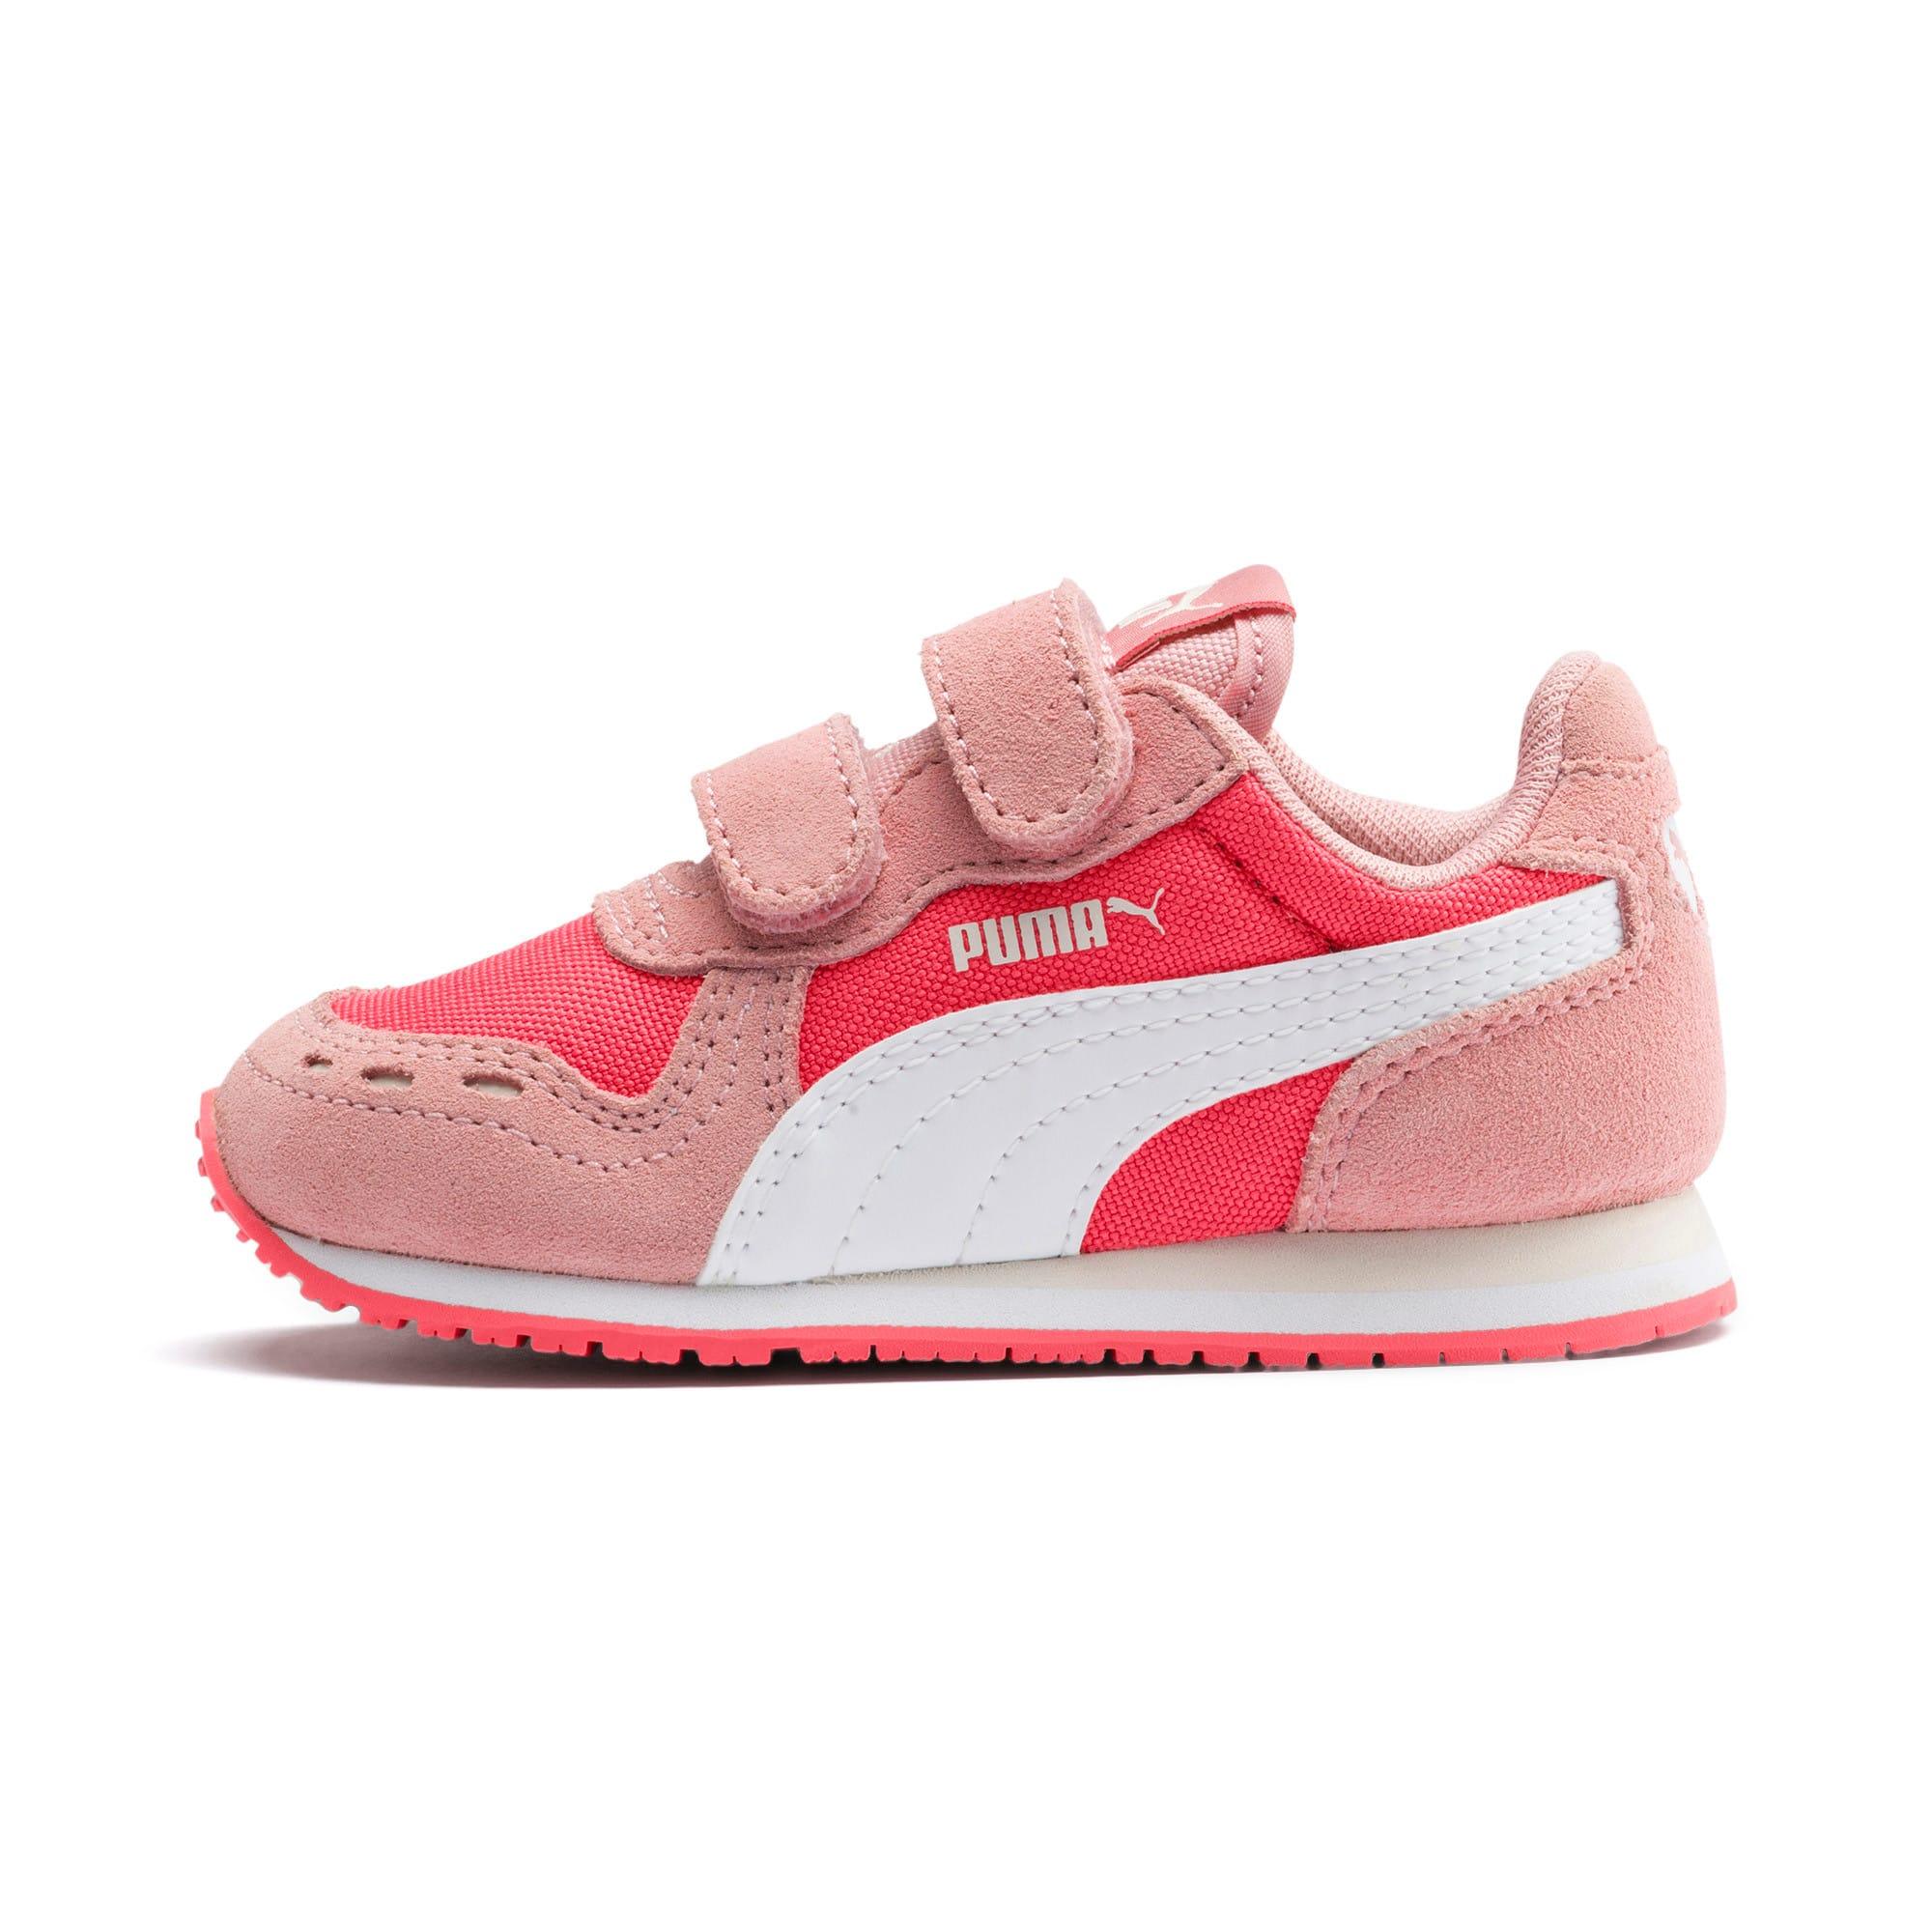 Thumbnail 1 of Cabana Racer Toddler Shoes, Calypso Coral-Bridal Rose, medium